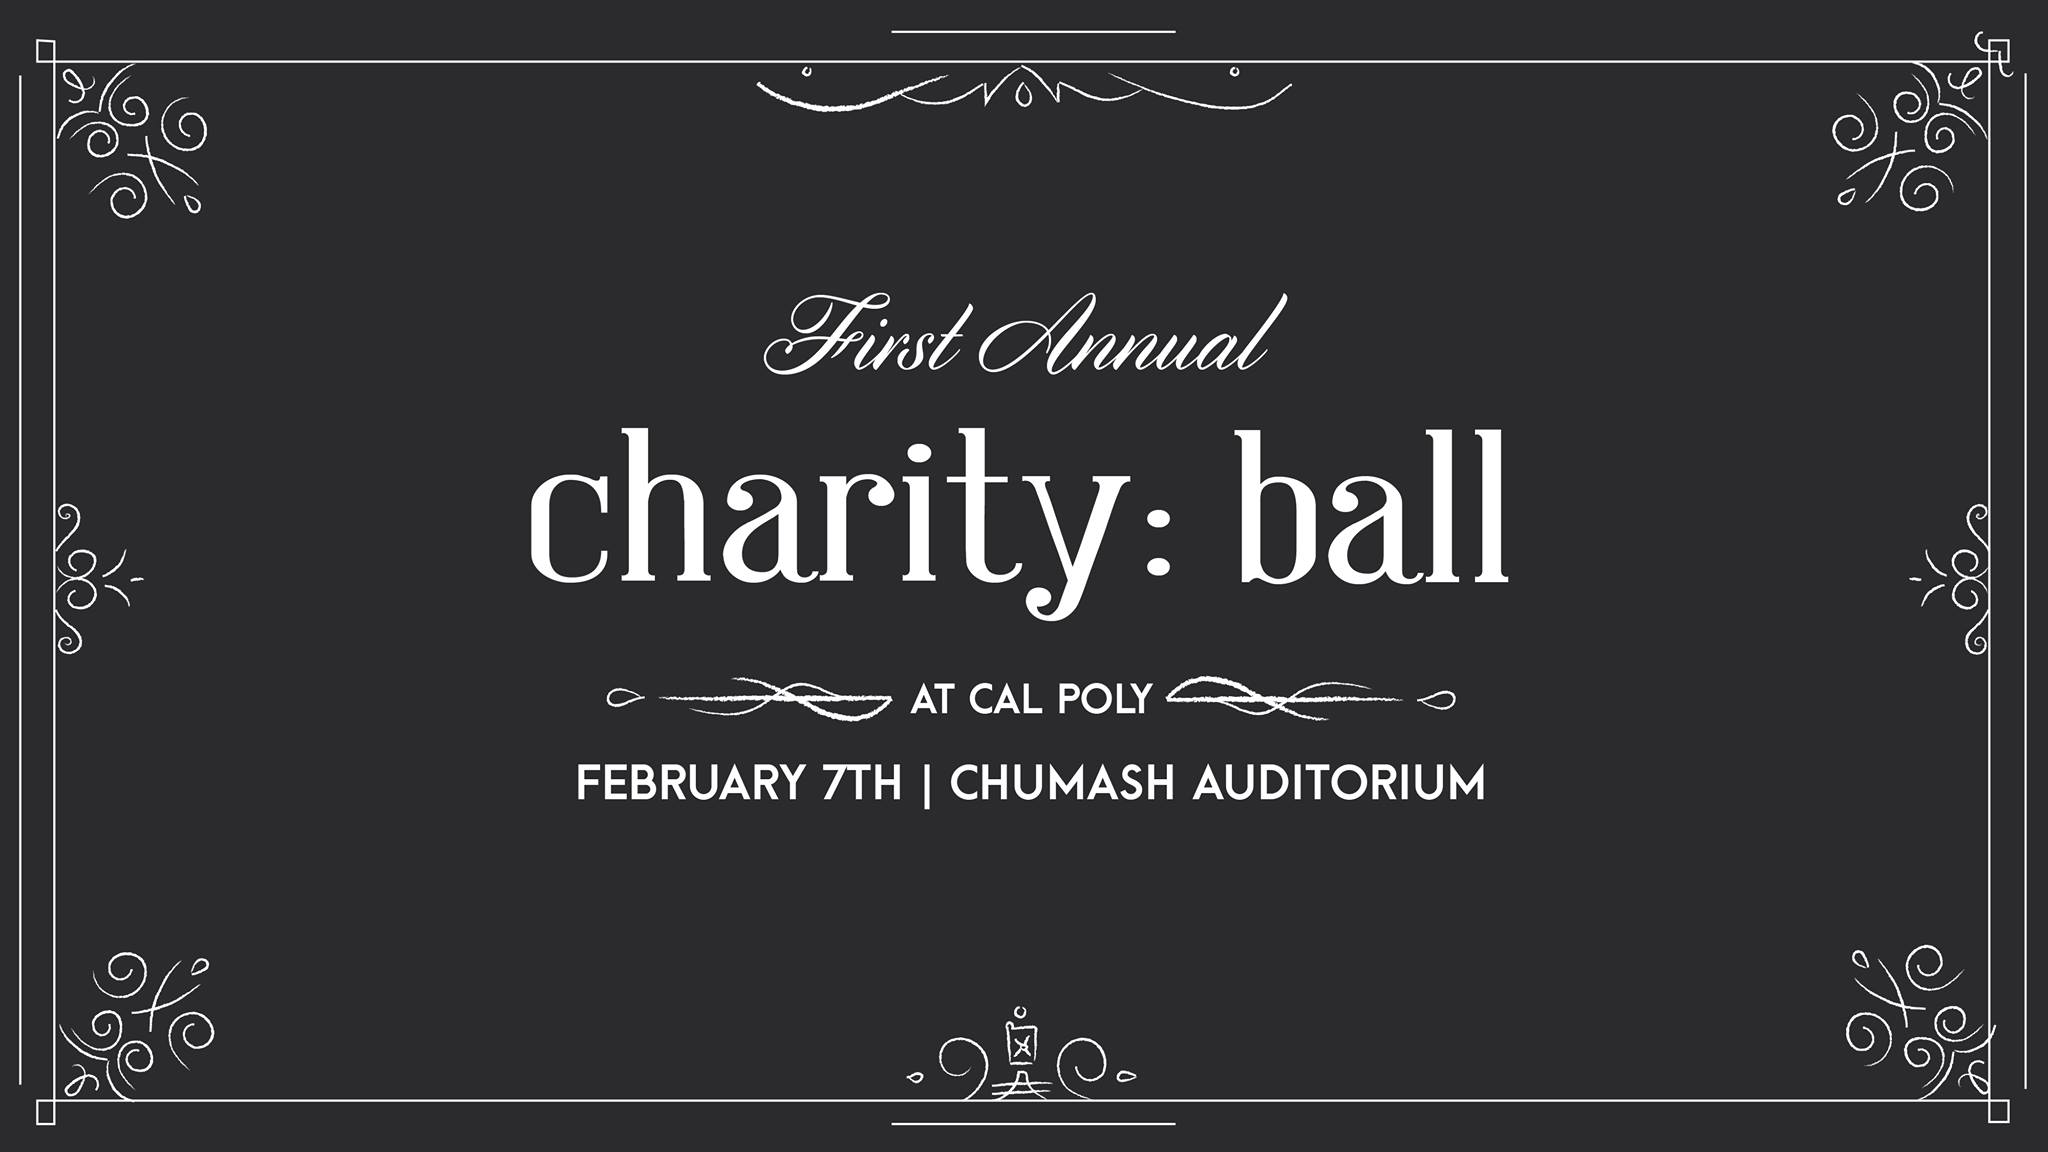 charity ball invite.jpg